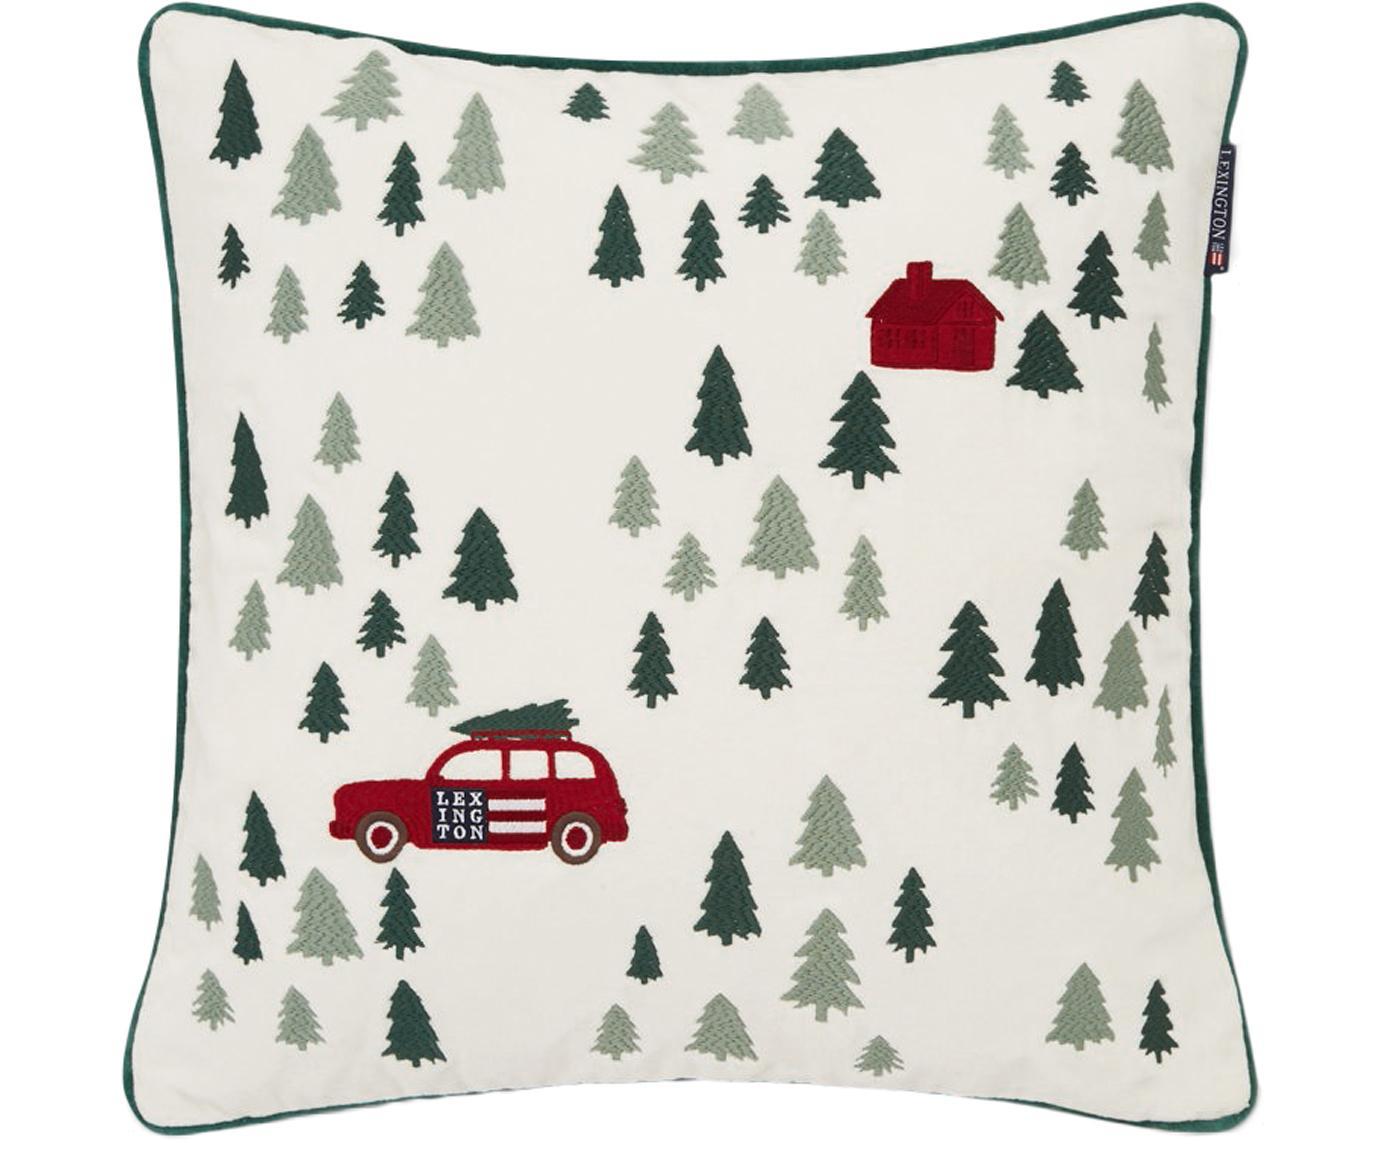 Bestickte Samt-Kissenhülle Holiday, Baumwollsamt, Weiß, Rot, Grün, 50 x 50 cm